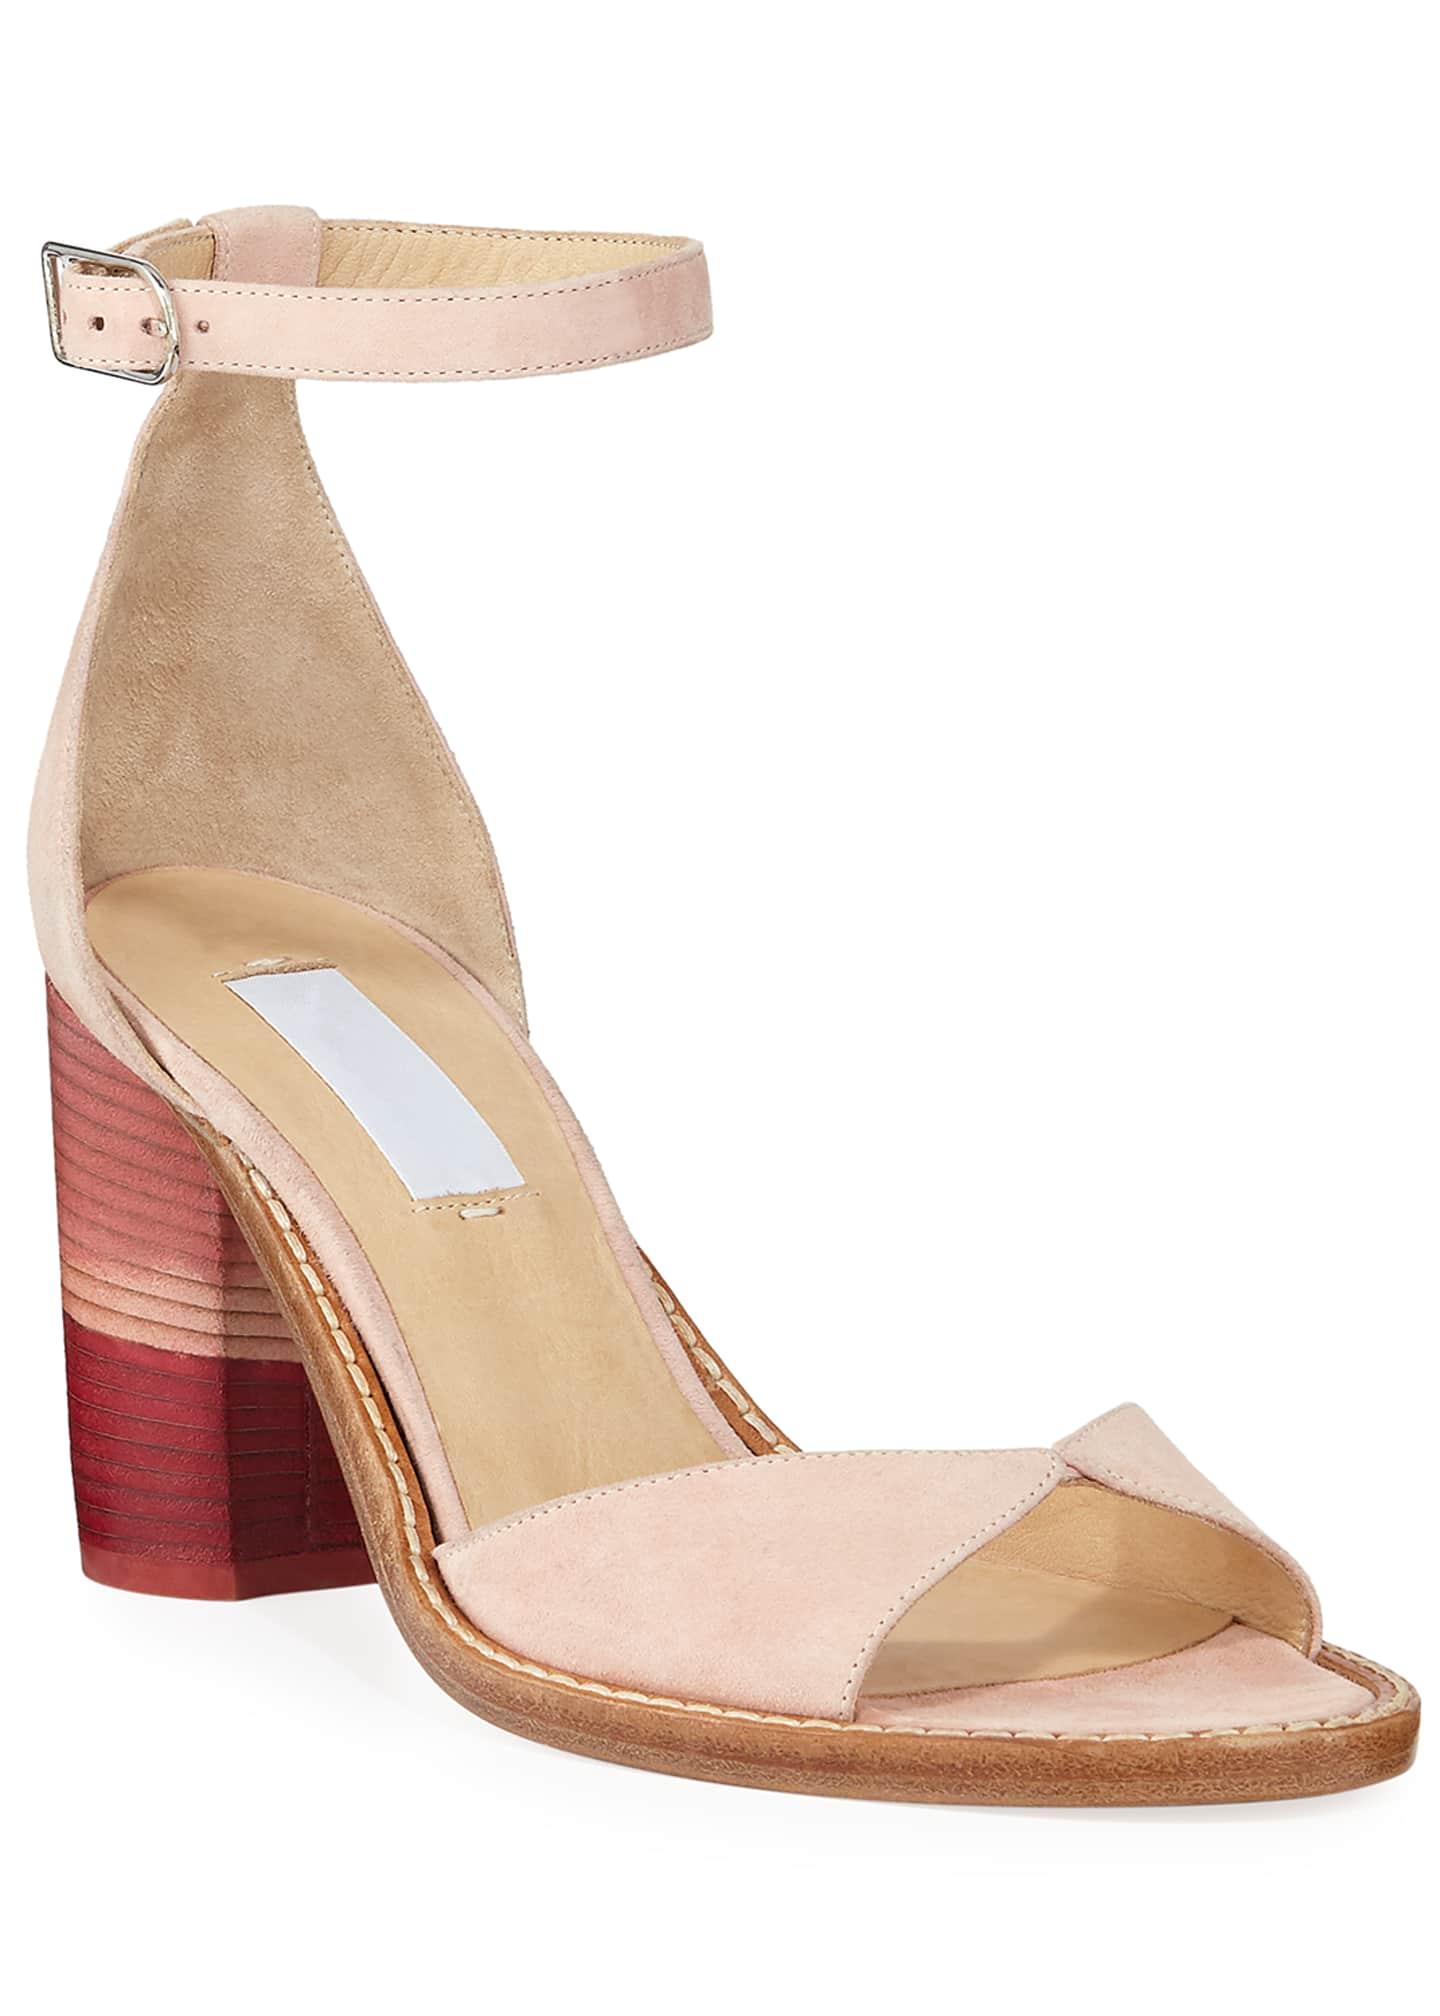 Gabriela Hearst Adi Suede Ombre Sandals